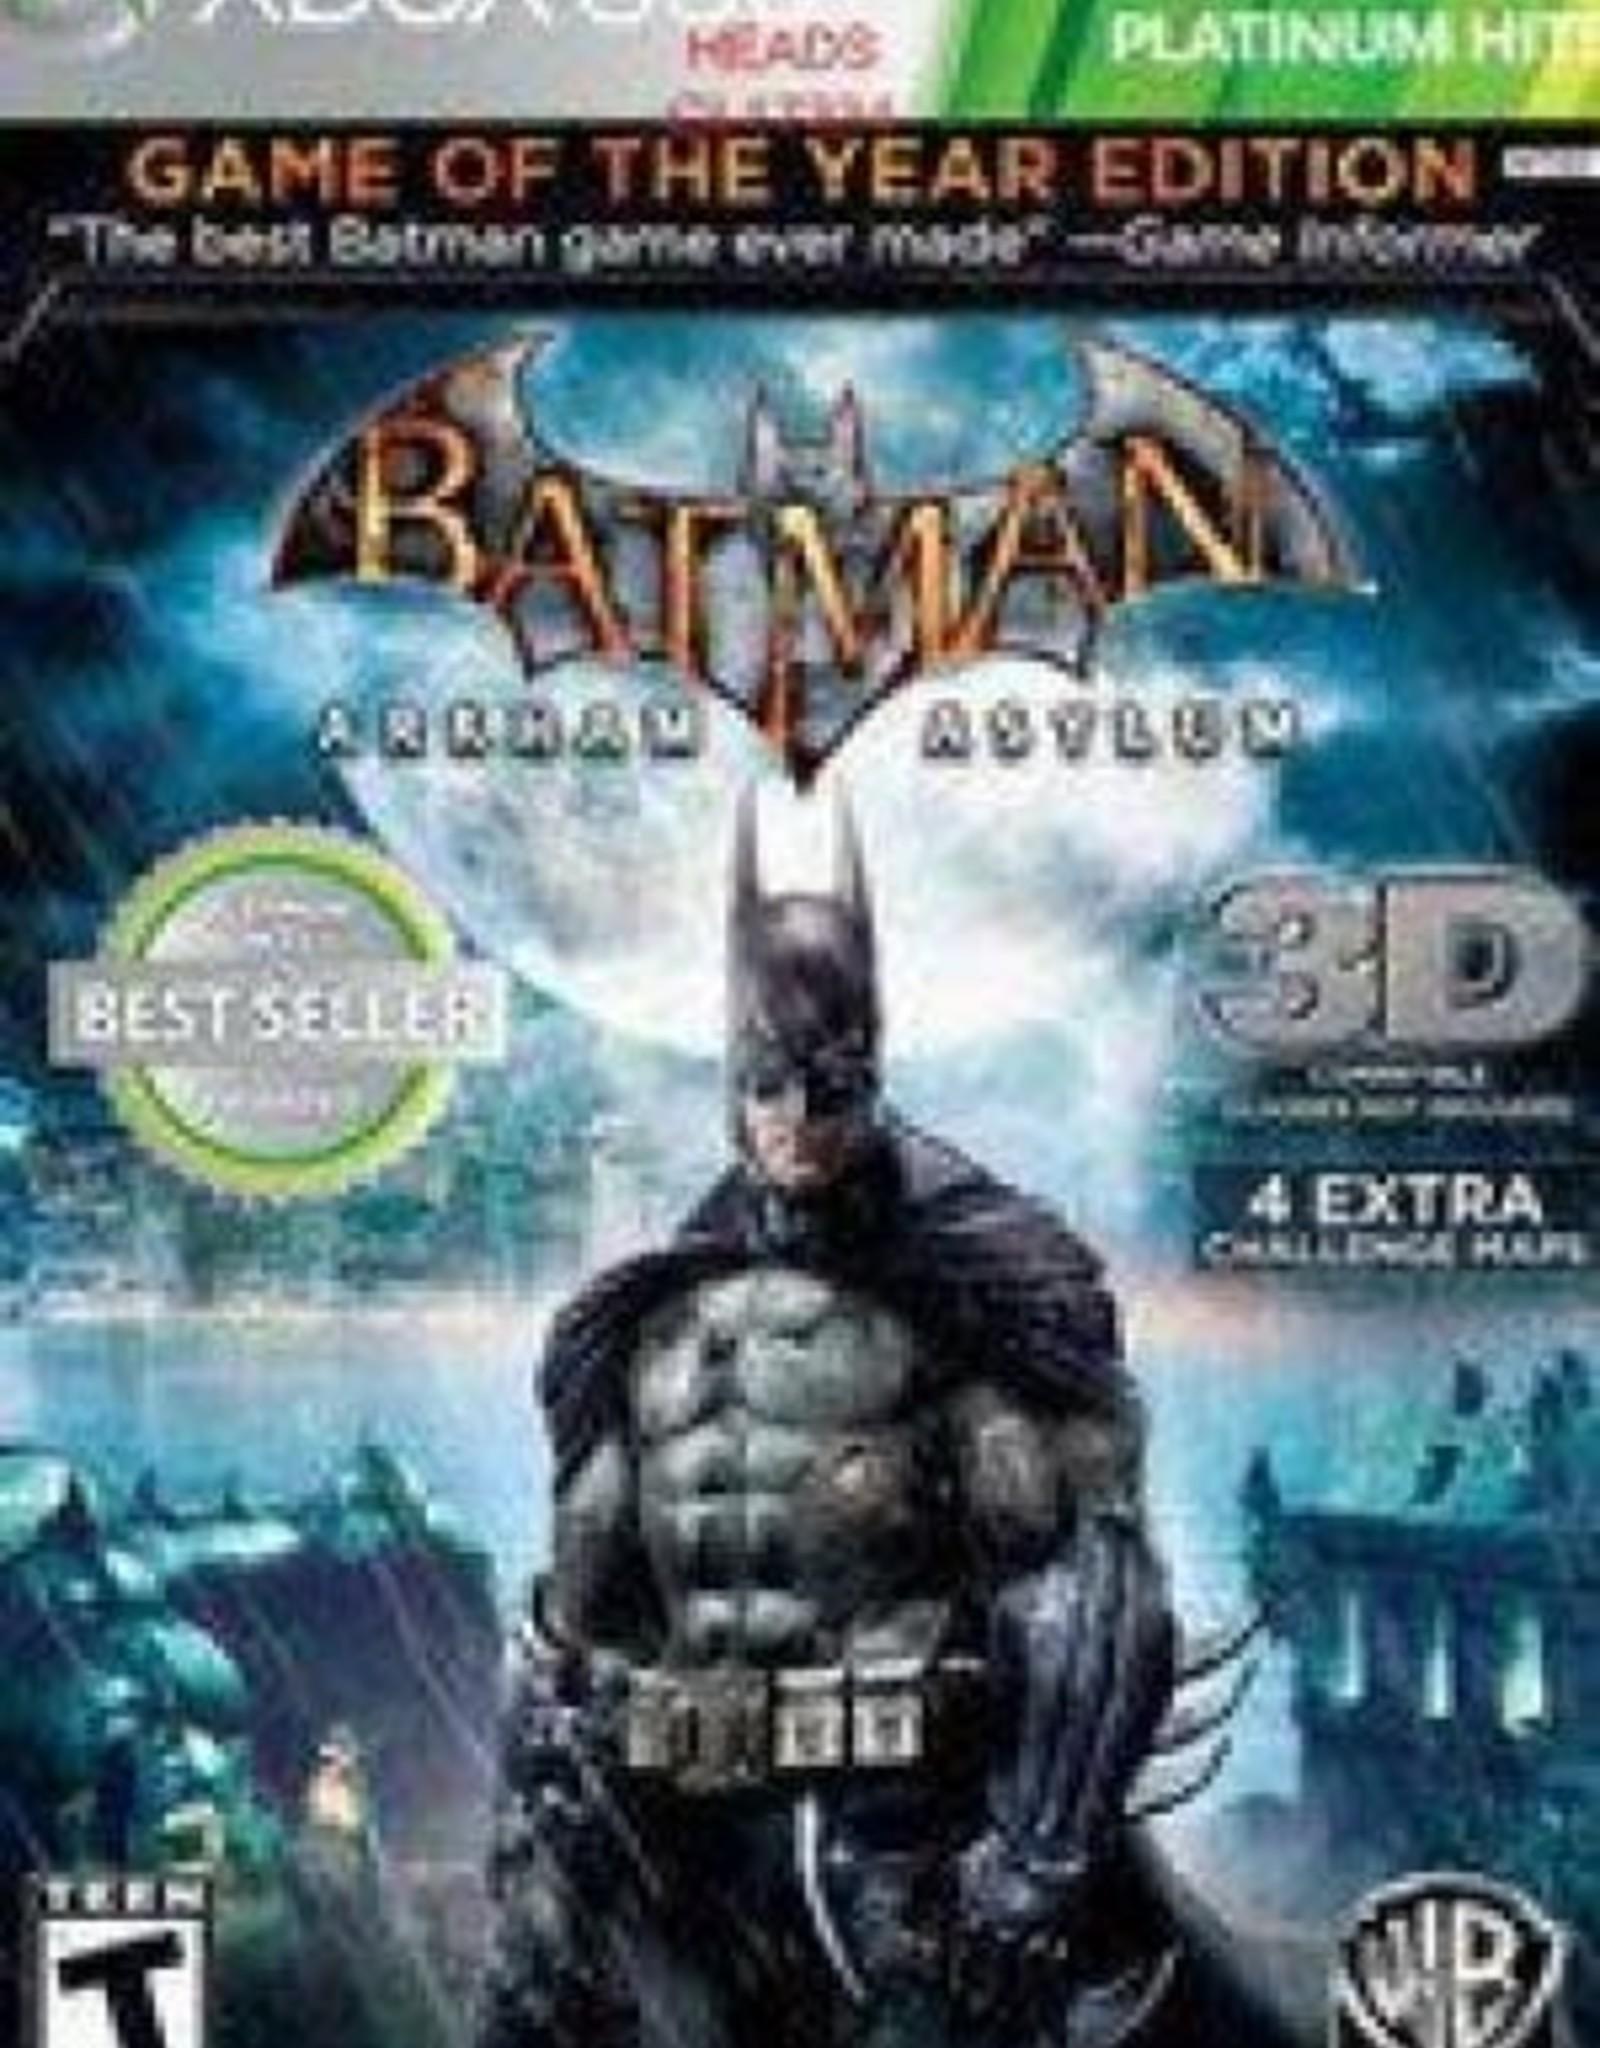 Xbox 360 Batman: Arkham Asylum Game of the Year Edition